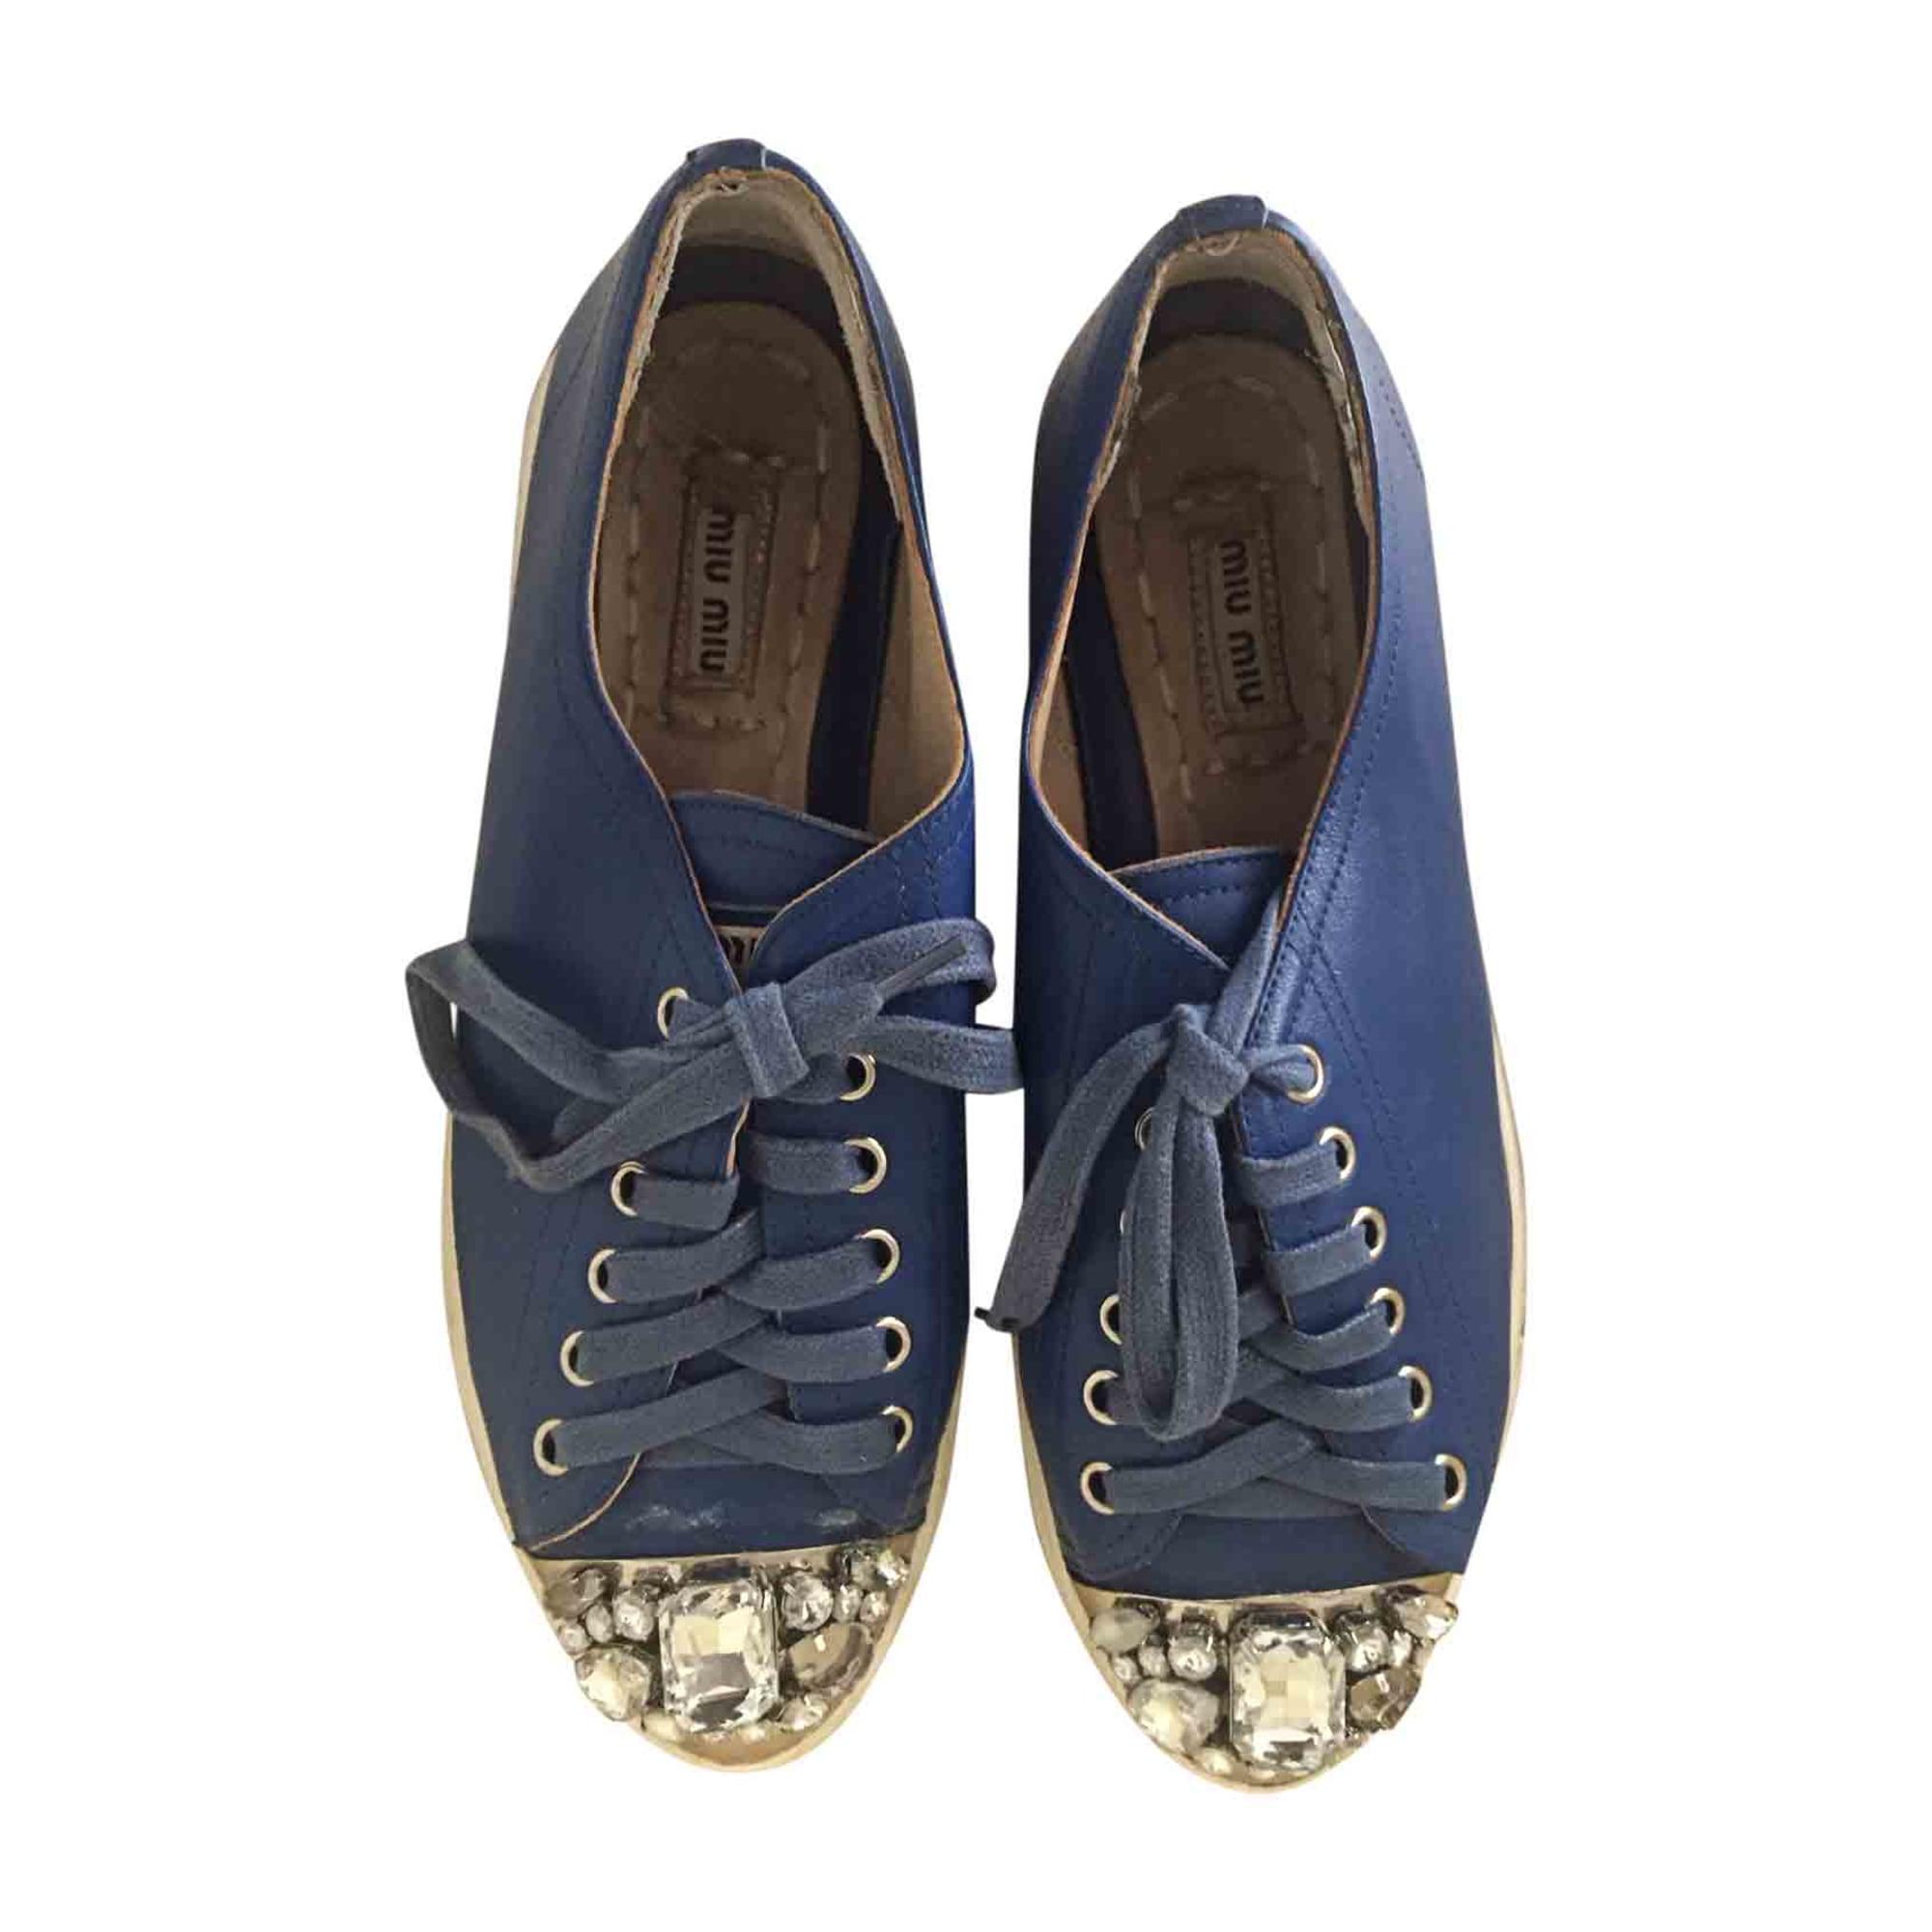 Sneakers MIU MIU Embellished Blue, navy, turquoise